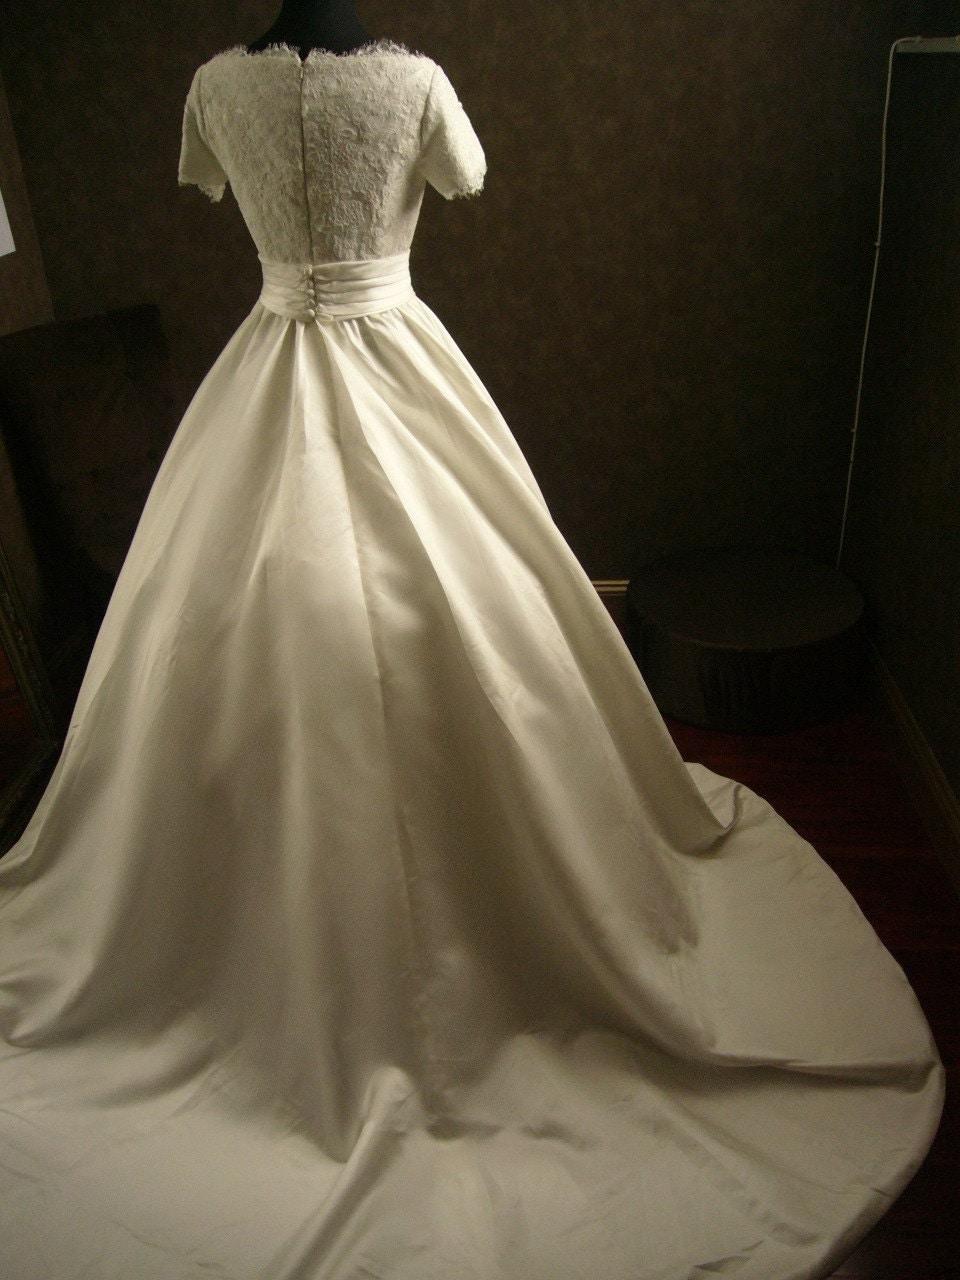 Custom Made Wedding Dress with Alencon French Lace Gathered